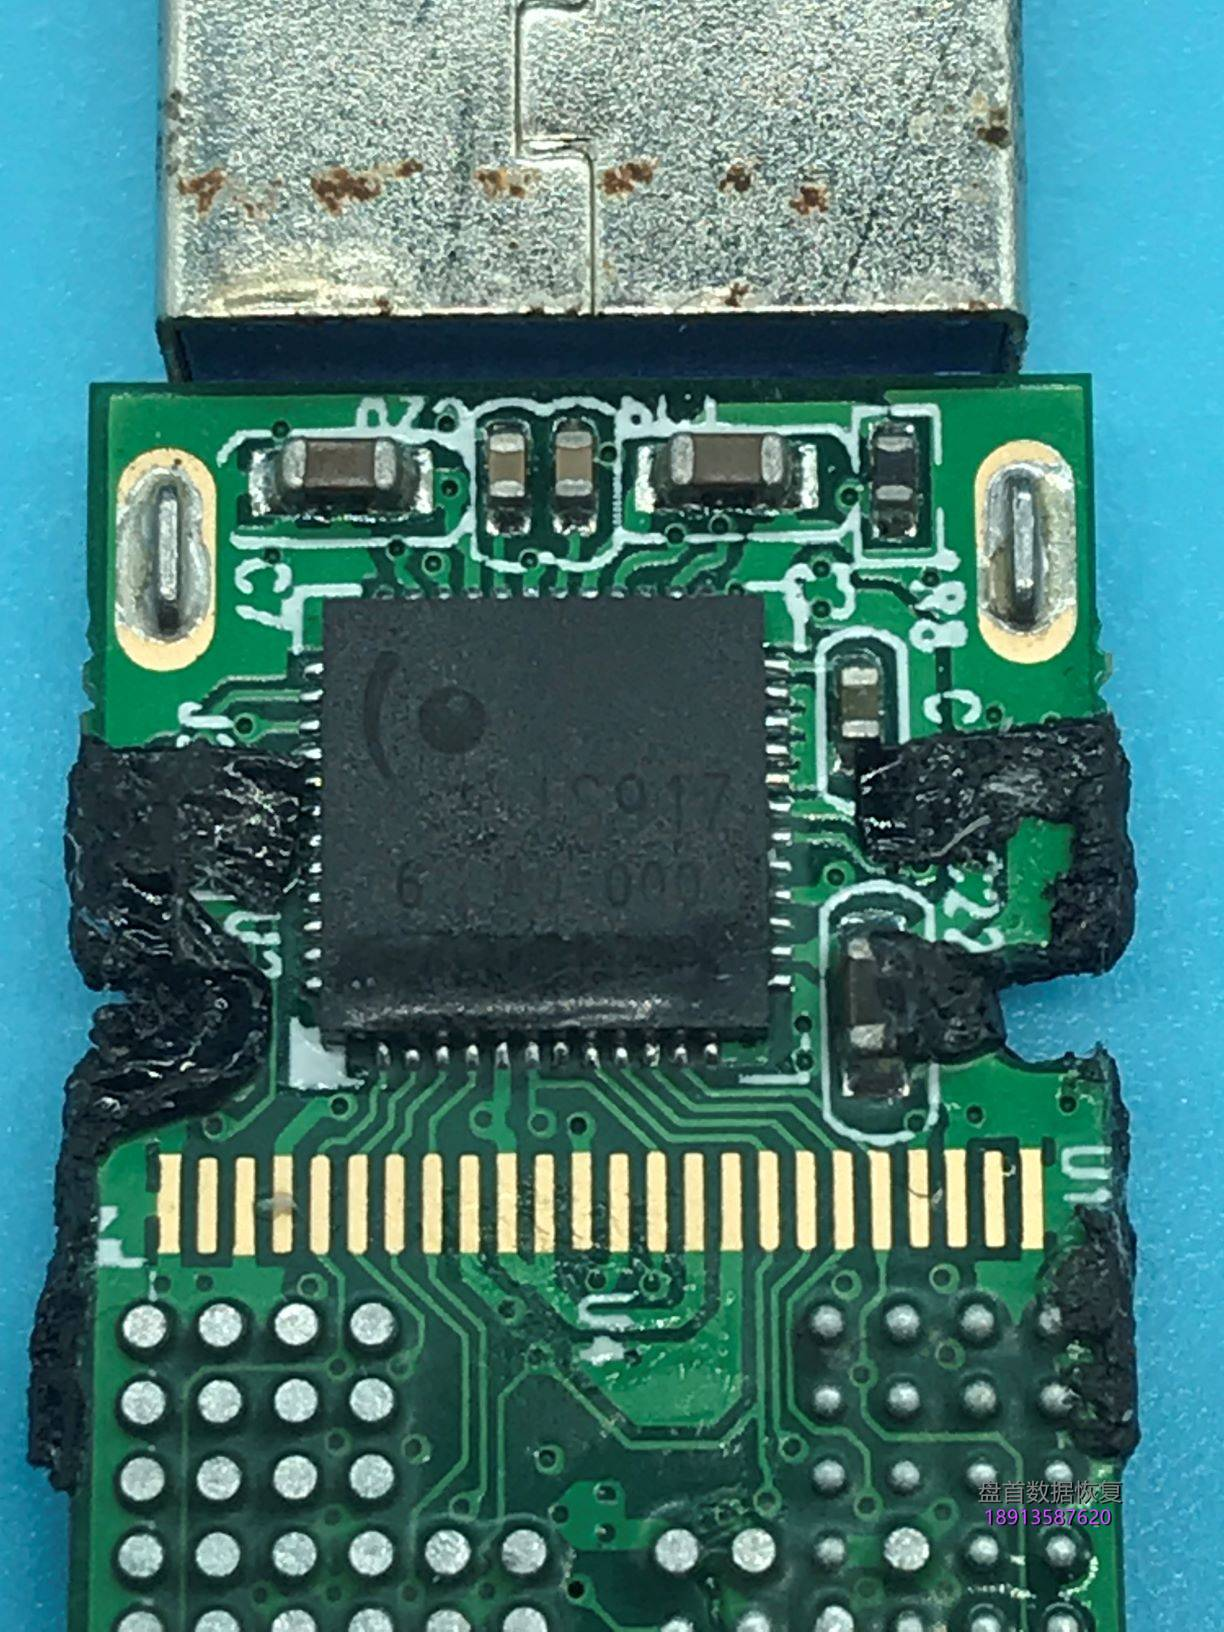 0-5 U盘打开提示请插入磁盘eaget忆捷16GU盘IS917主控芯片级数据恢复成功